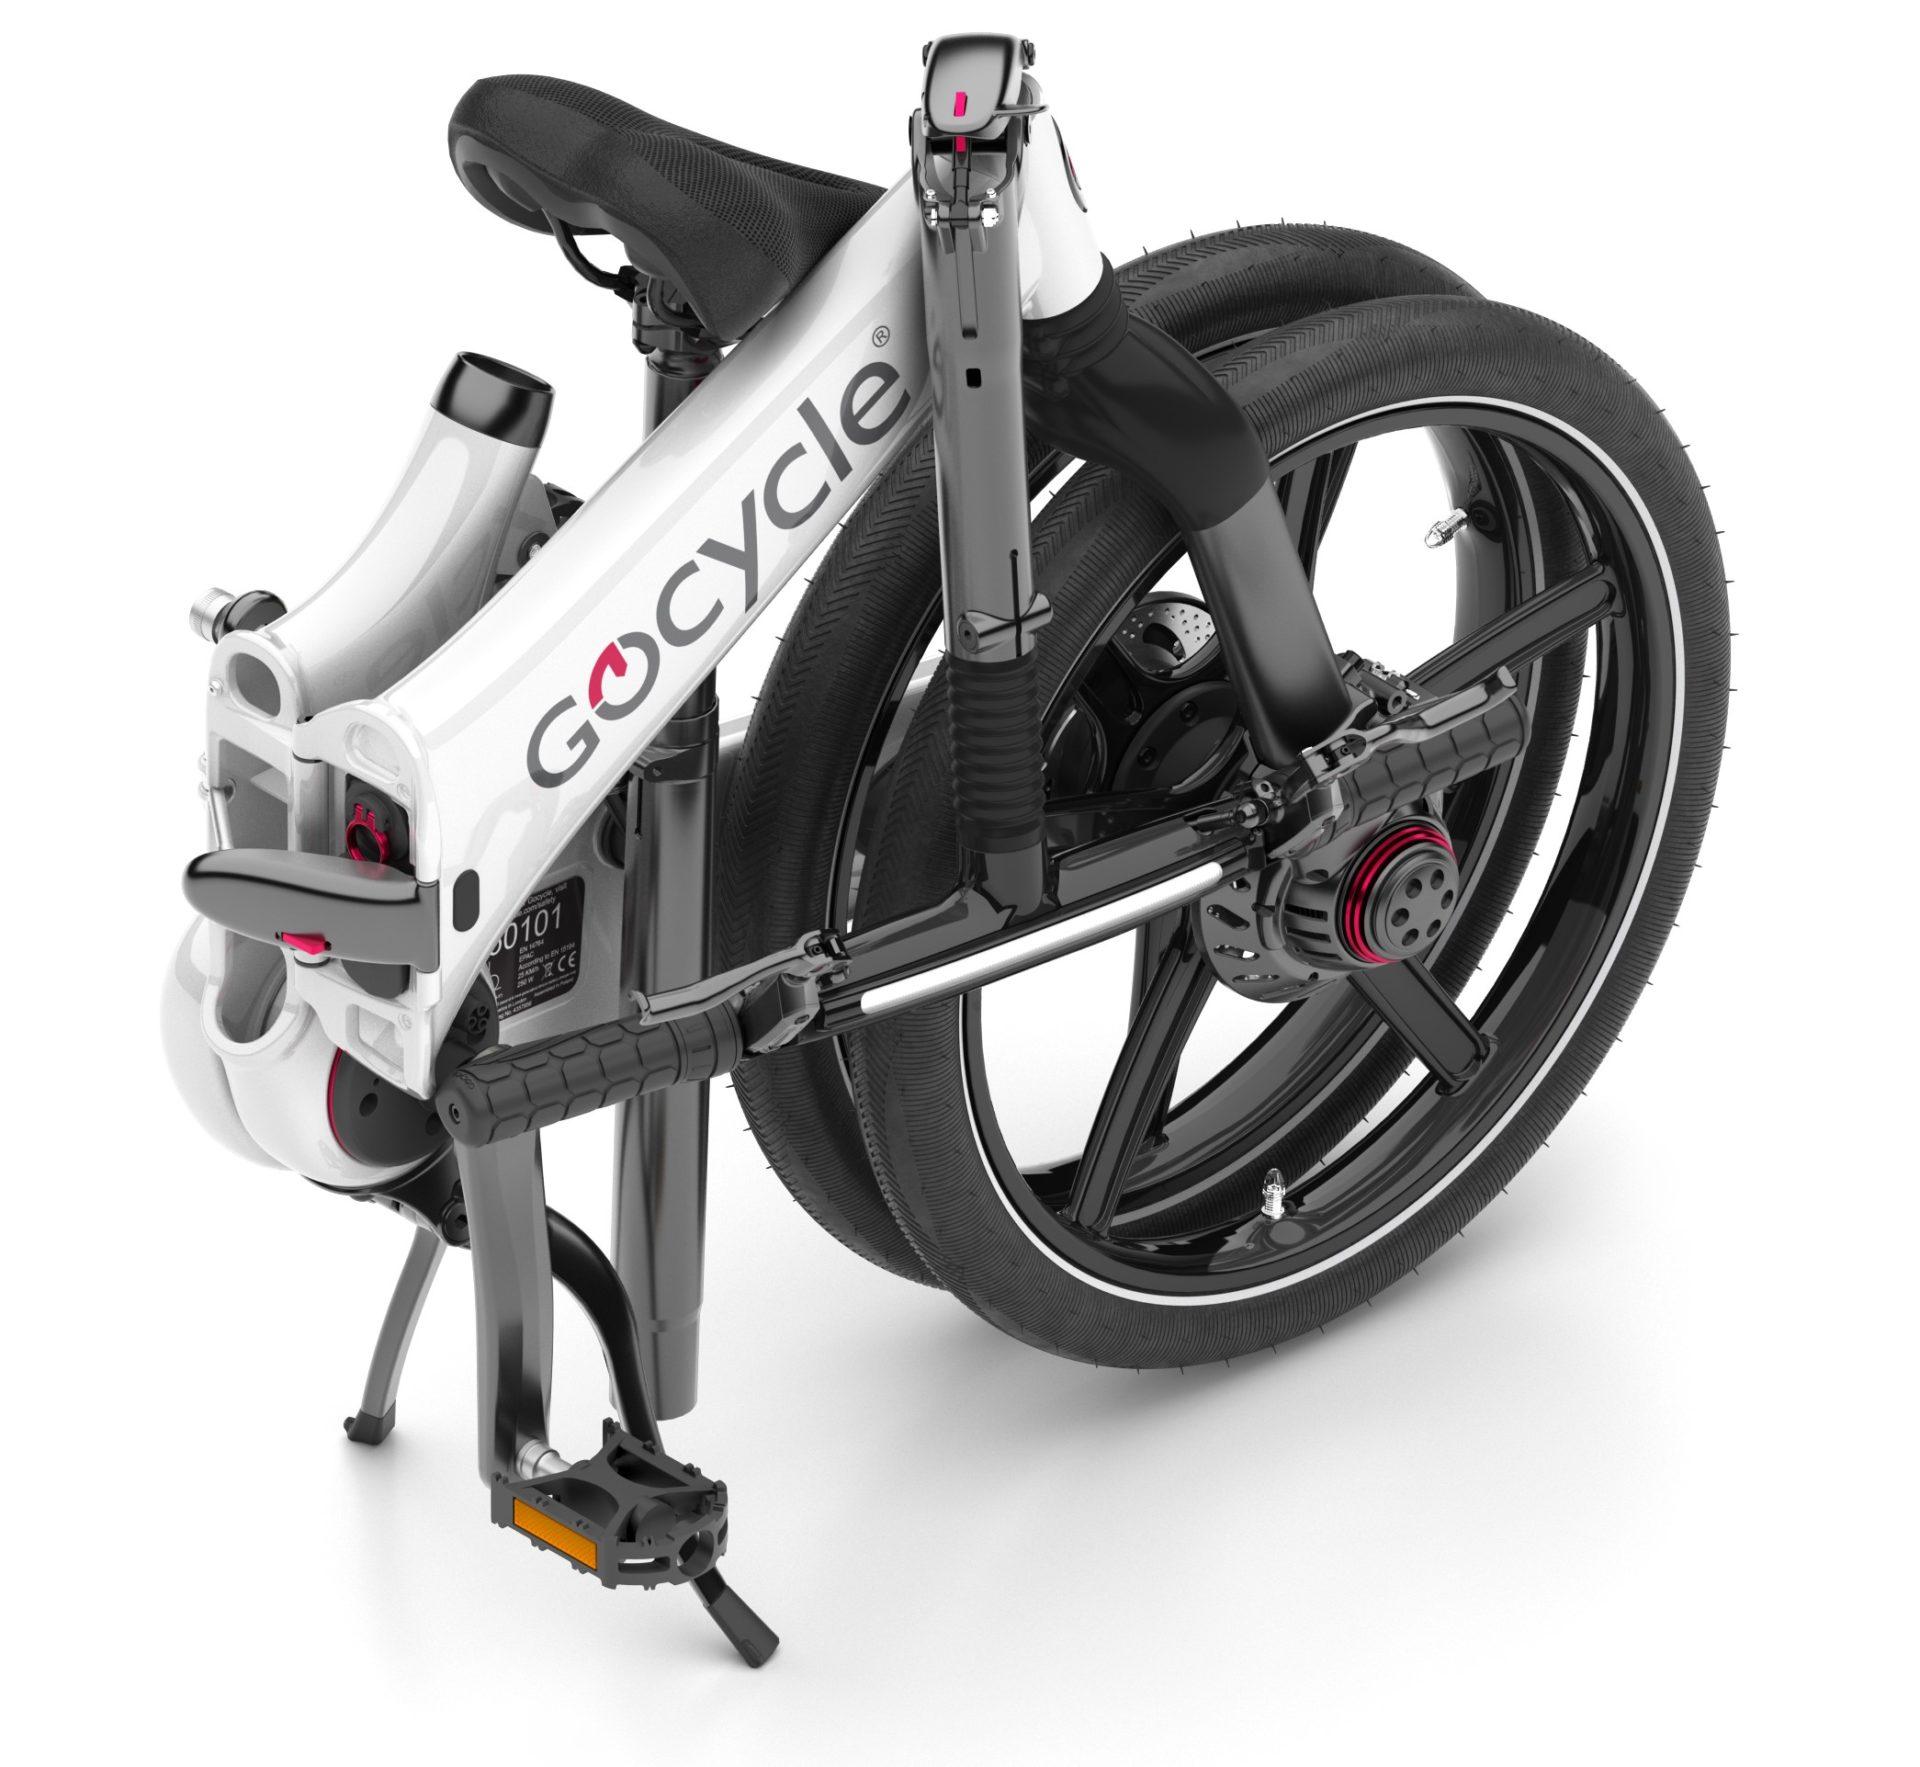 Gocycle GXi sestavljeno kolo